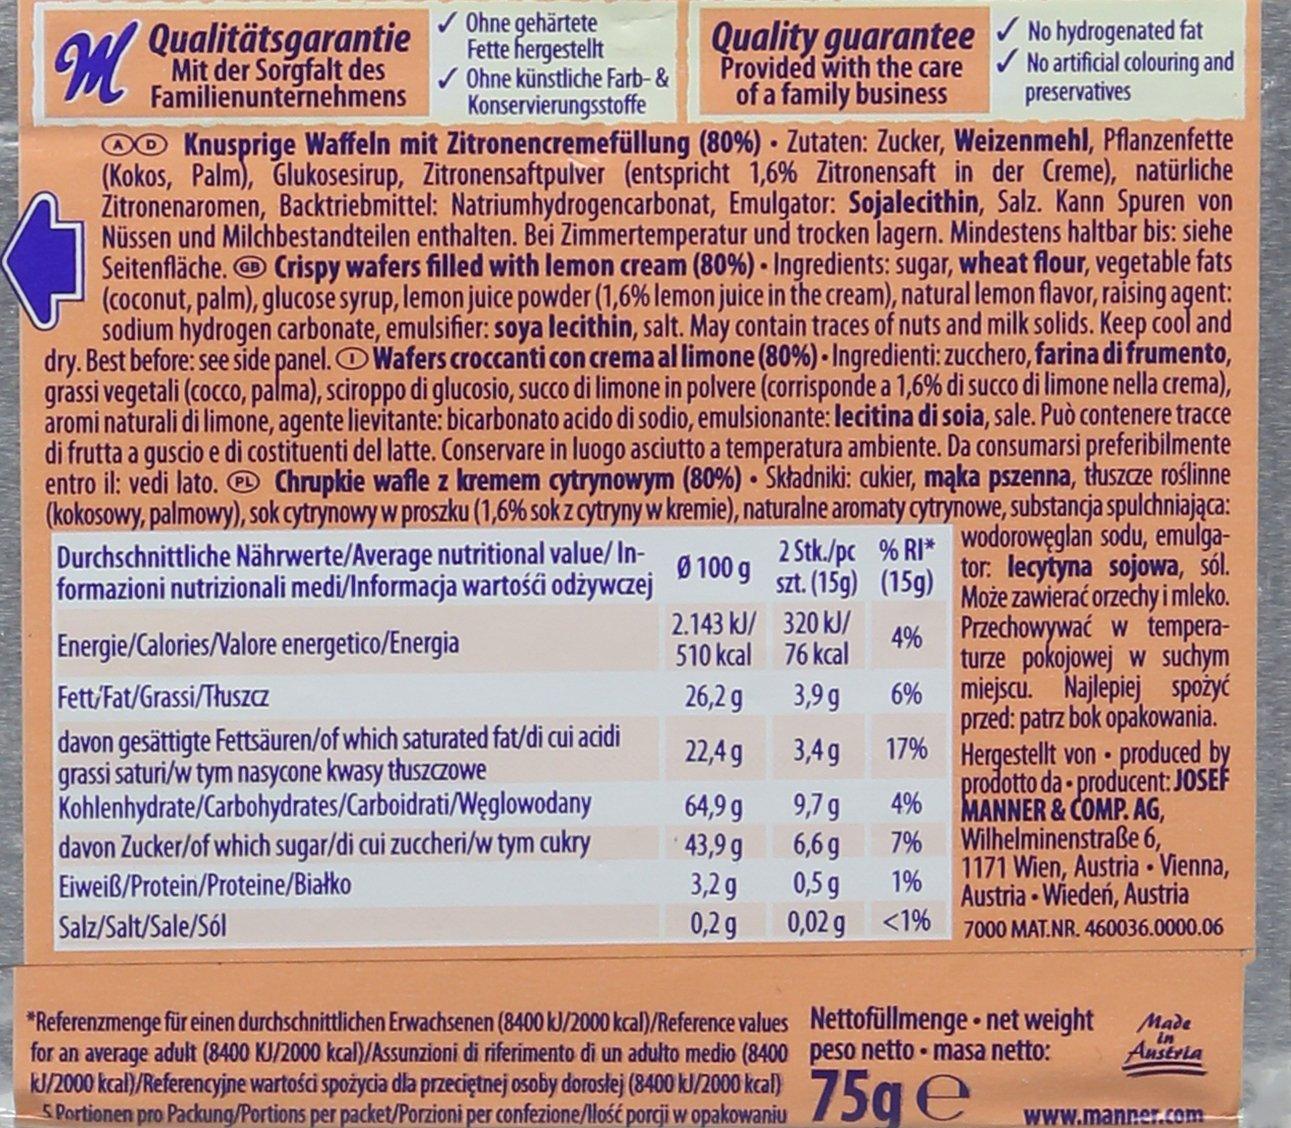 1 dadel kcal